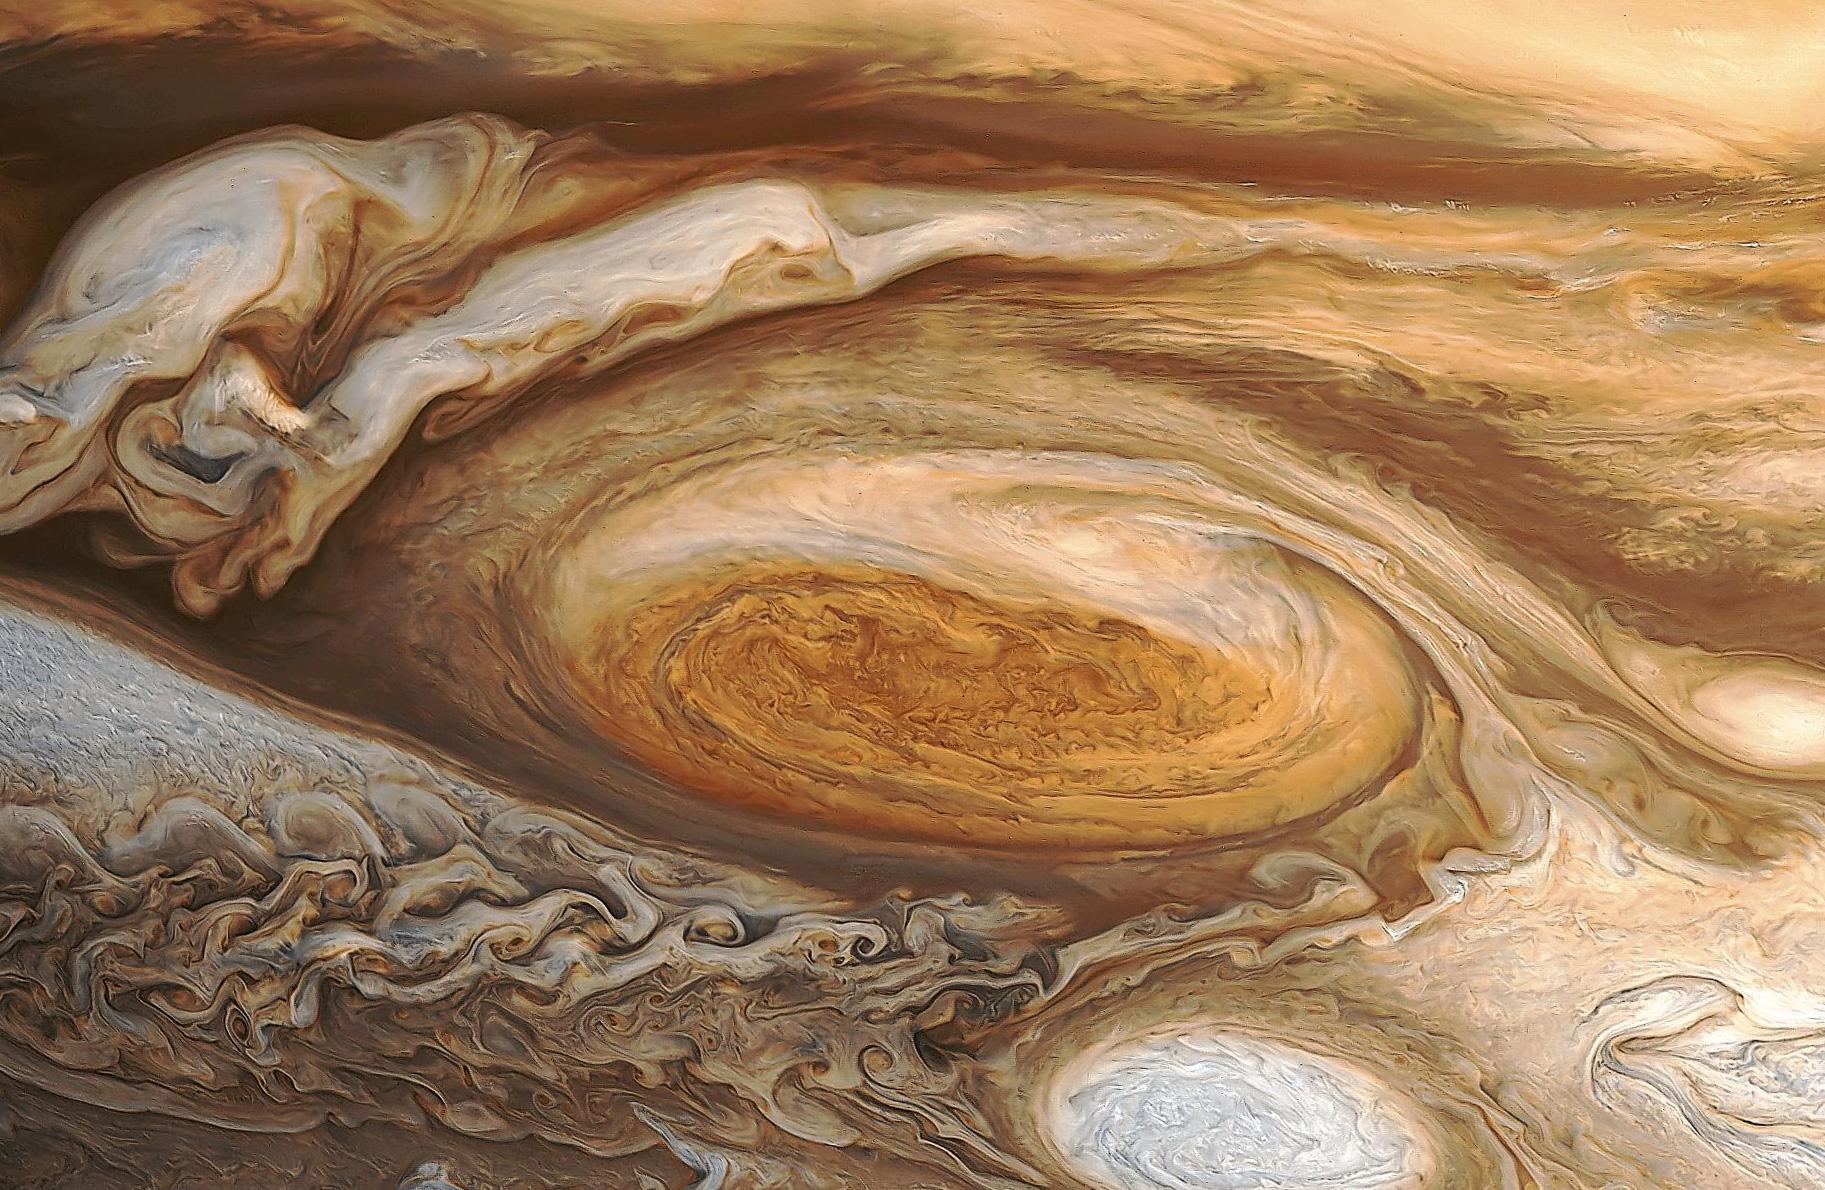 Jupiter Great Red Spot, Great Red Spot, biggest storm in the solar system jupiter, jupiter great red spot is shrinking, great red spot shrinks jupiter, jupiter great red spot shrinks